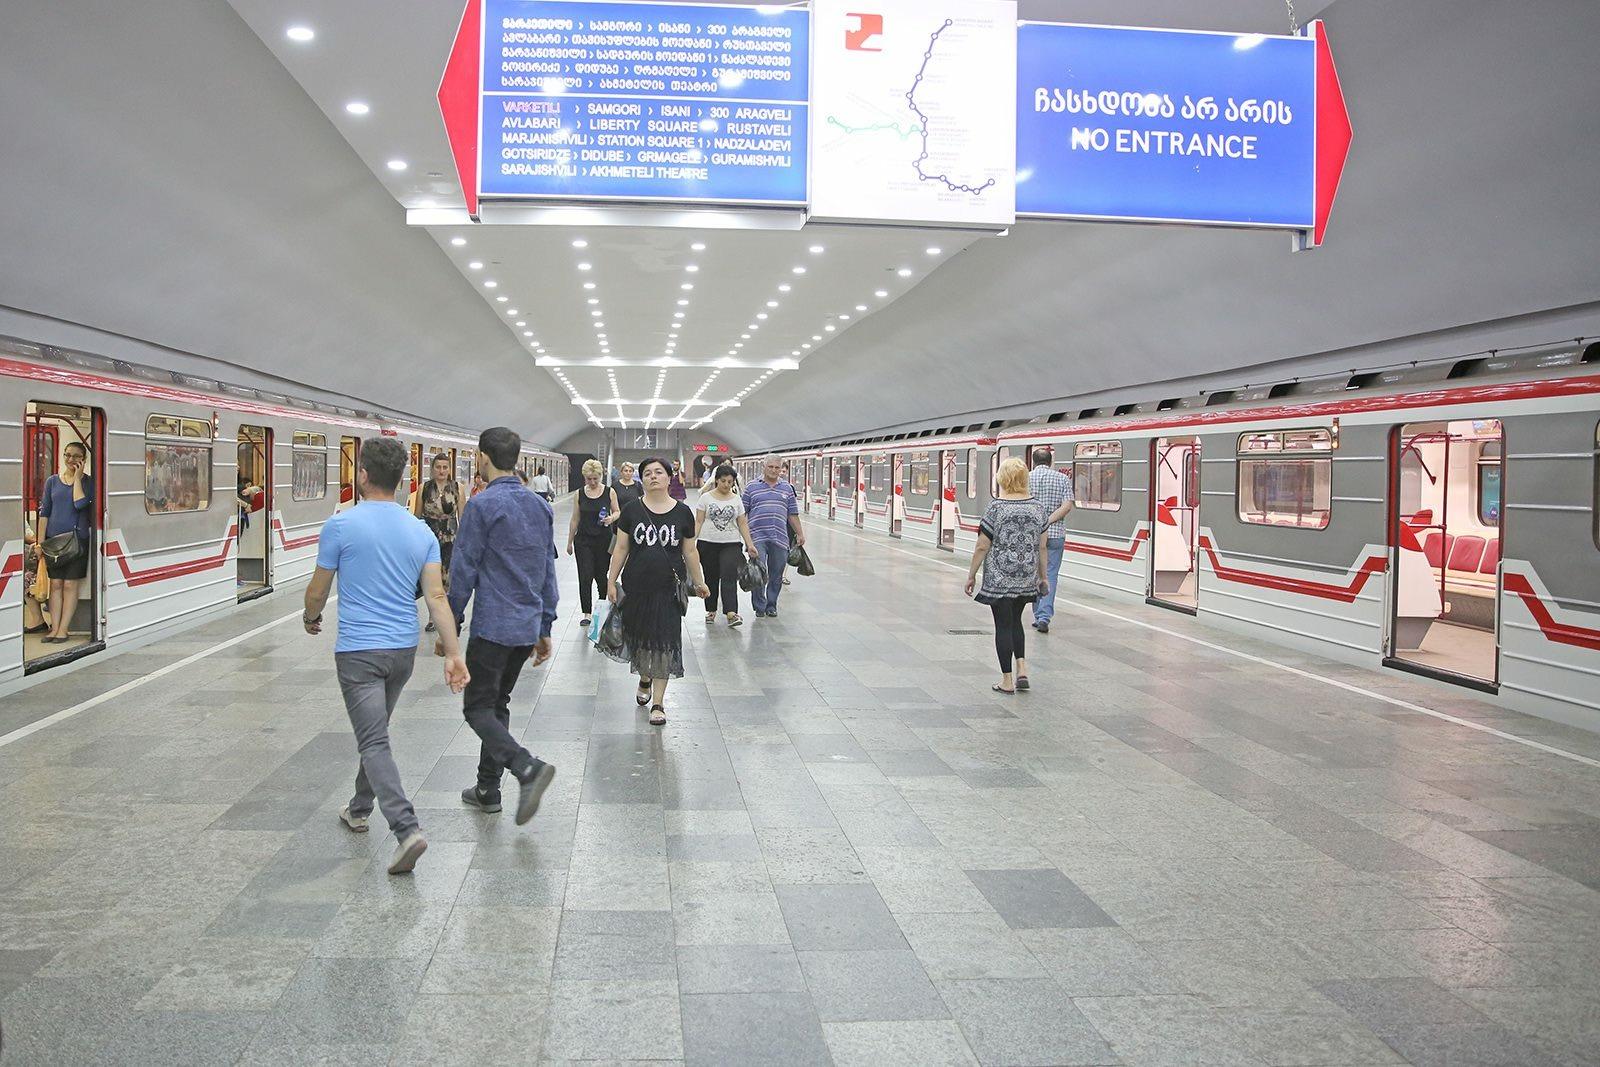 A37DA4A1 33CA 4E1D 8805 A51EC2CADE5F метро метро